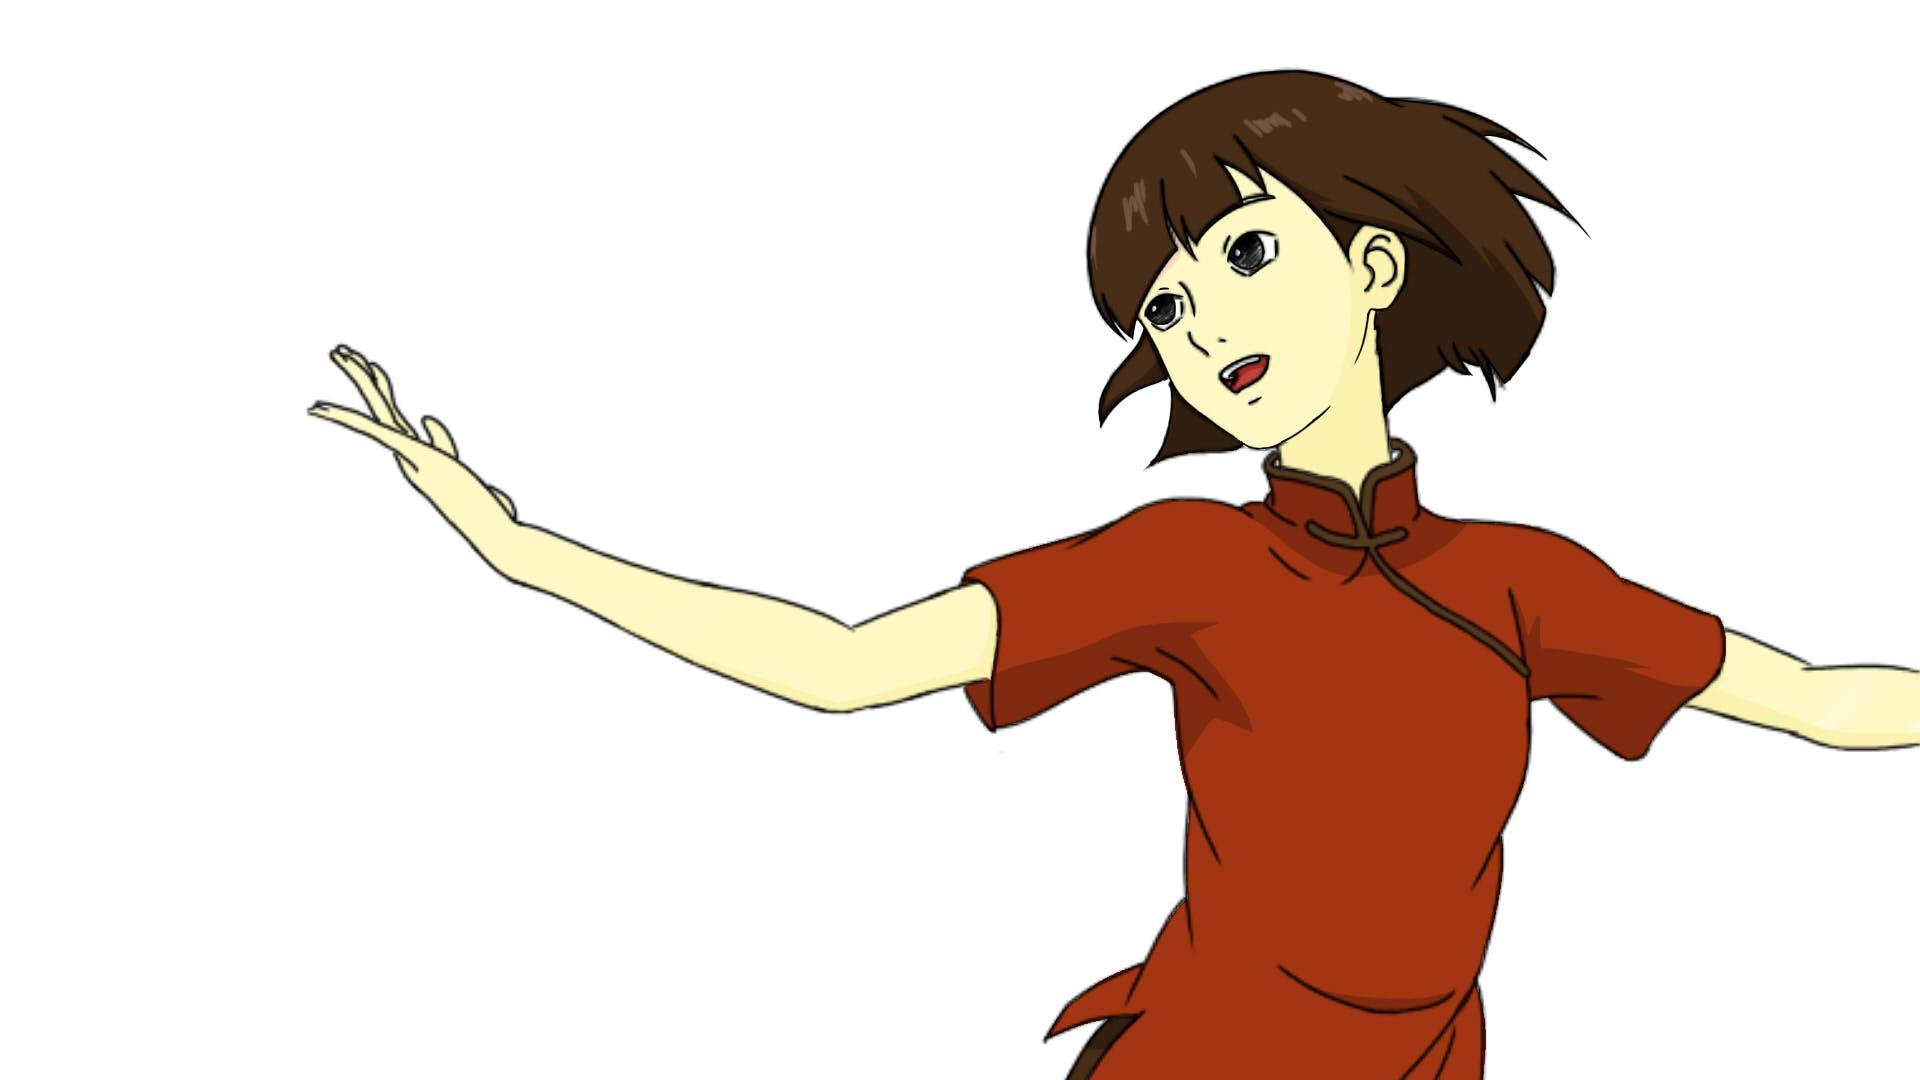 大鱼海棠Chinese girl